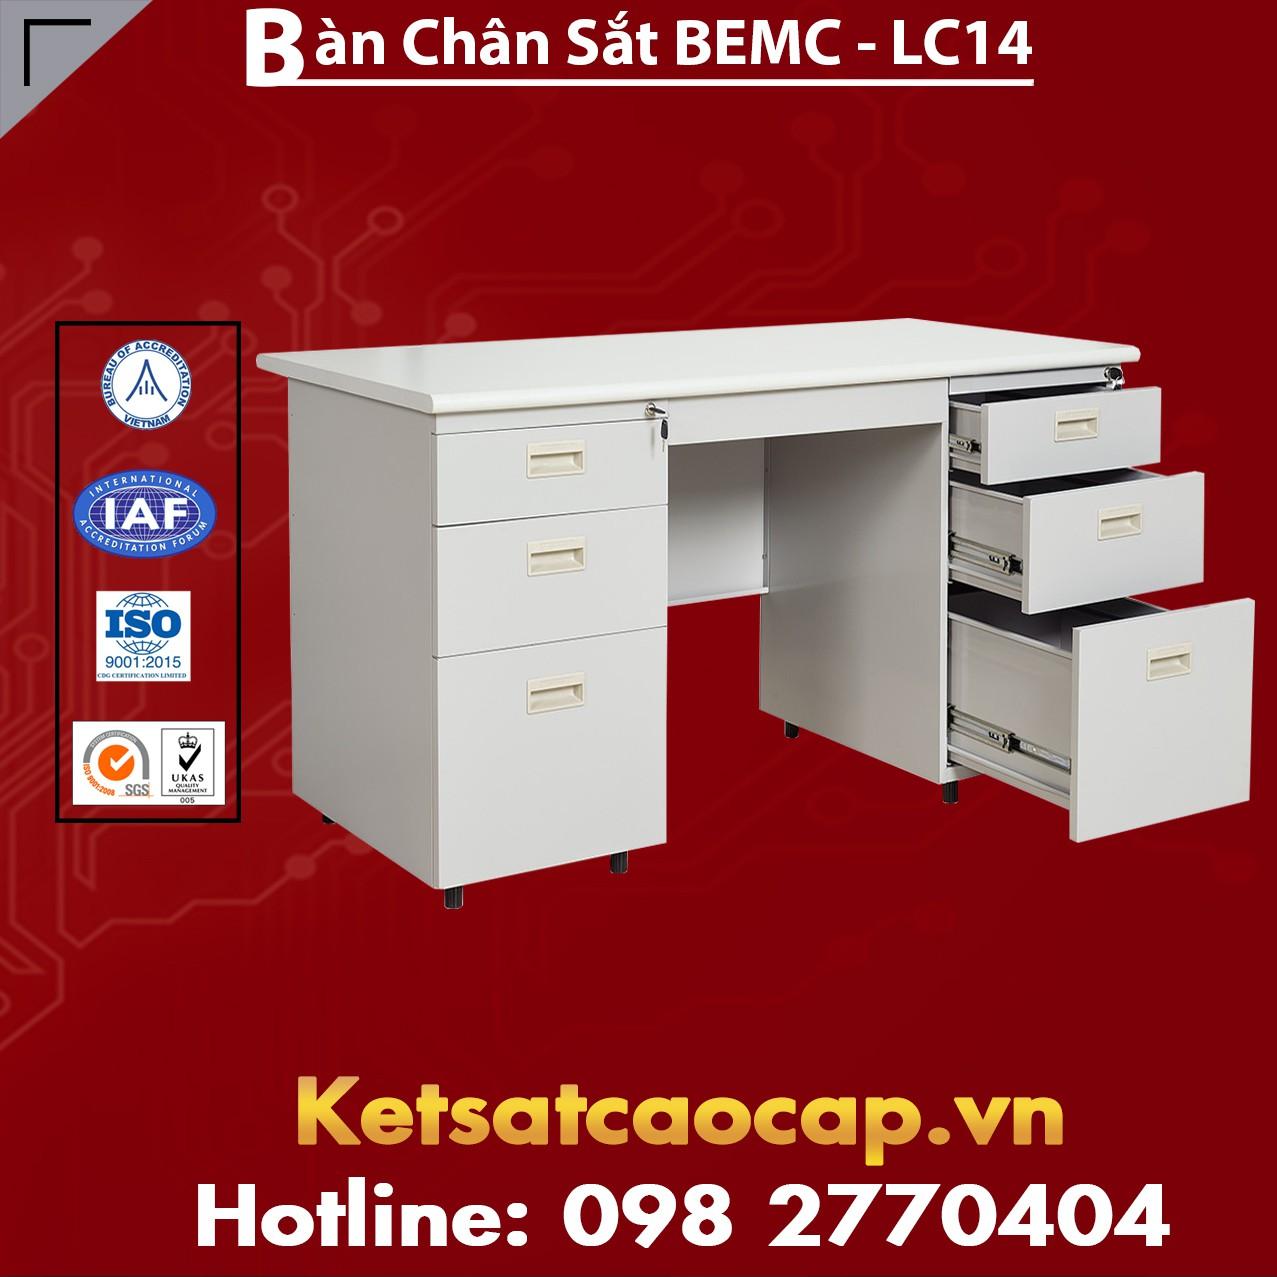 Bàn Chân Sắt BEMC - LC14